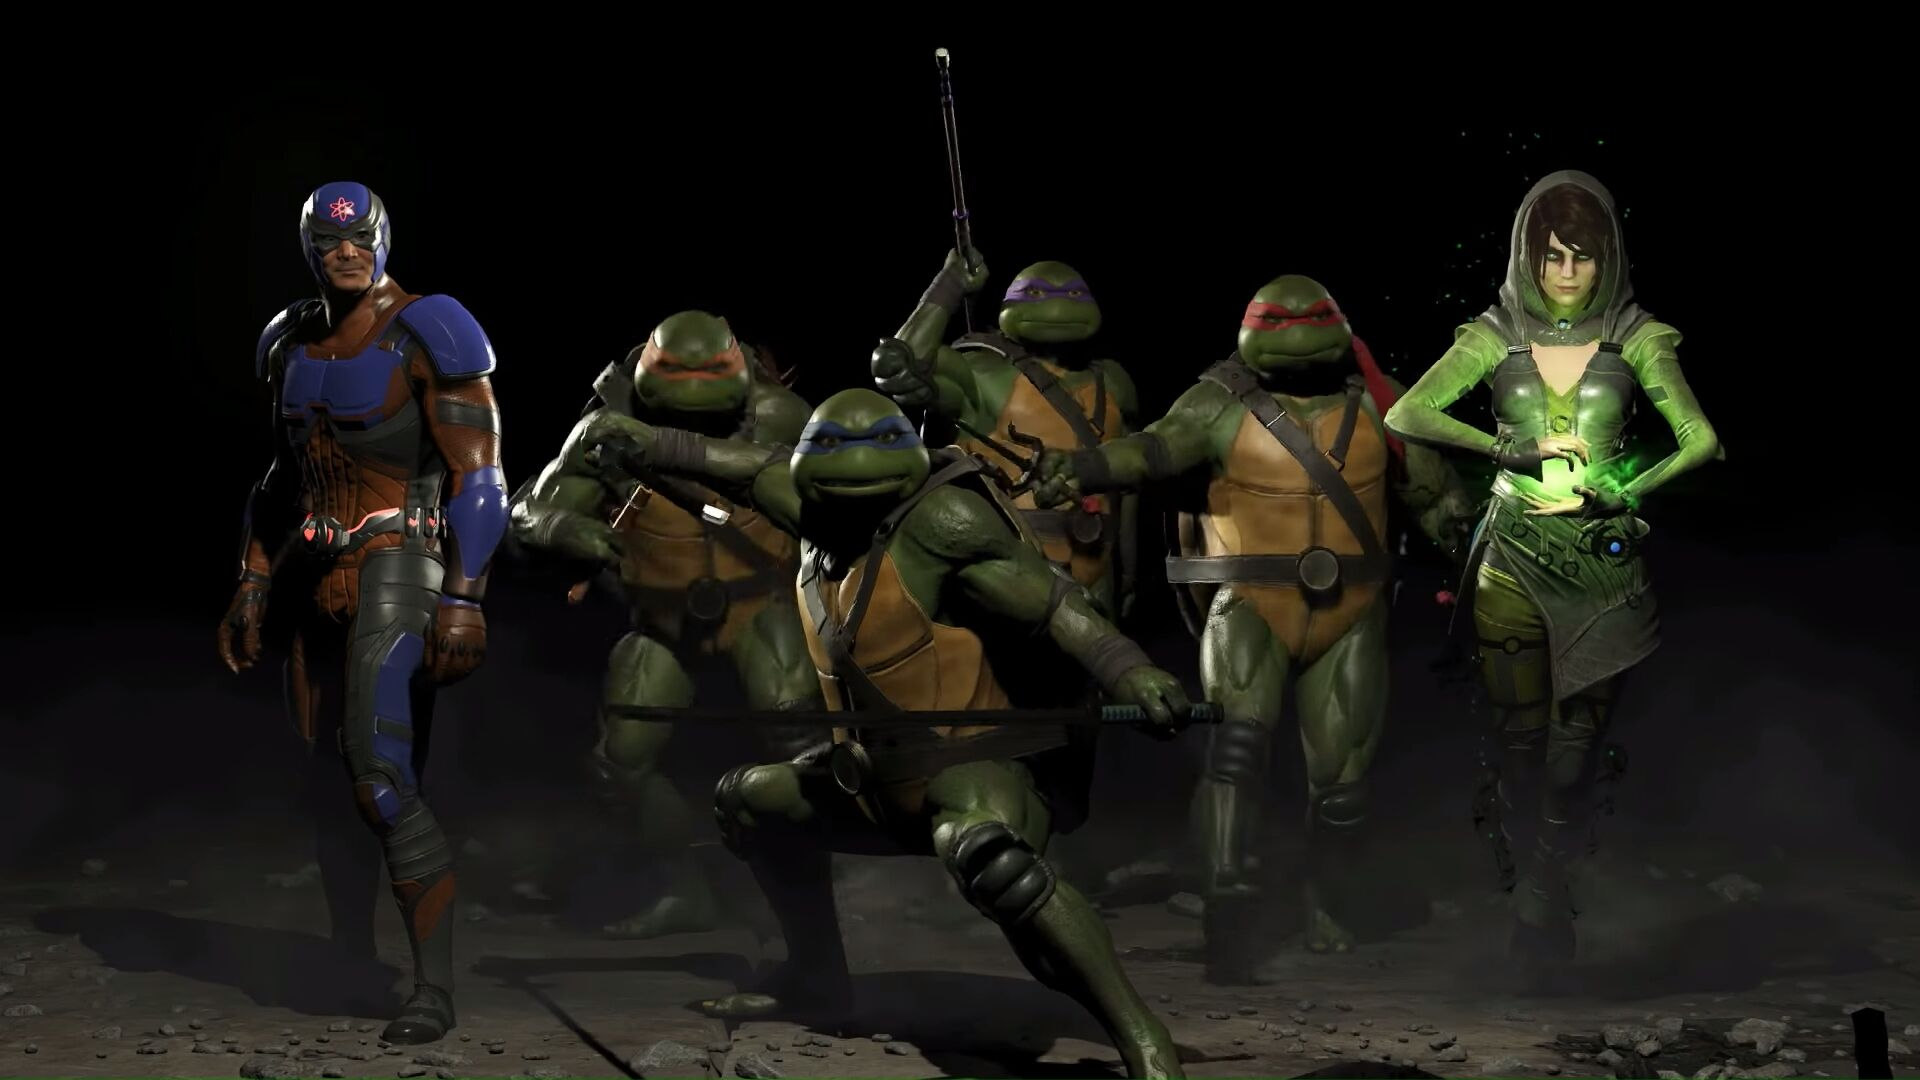 Injustice 2: Ninja Turtles, Atom and Enchantress make up Fighter Pack 3